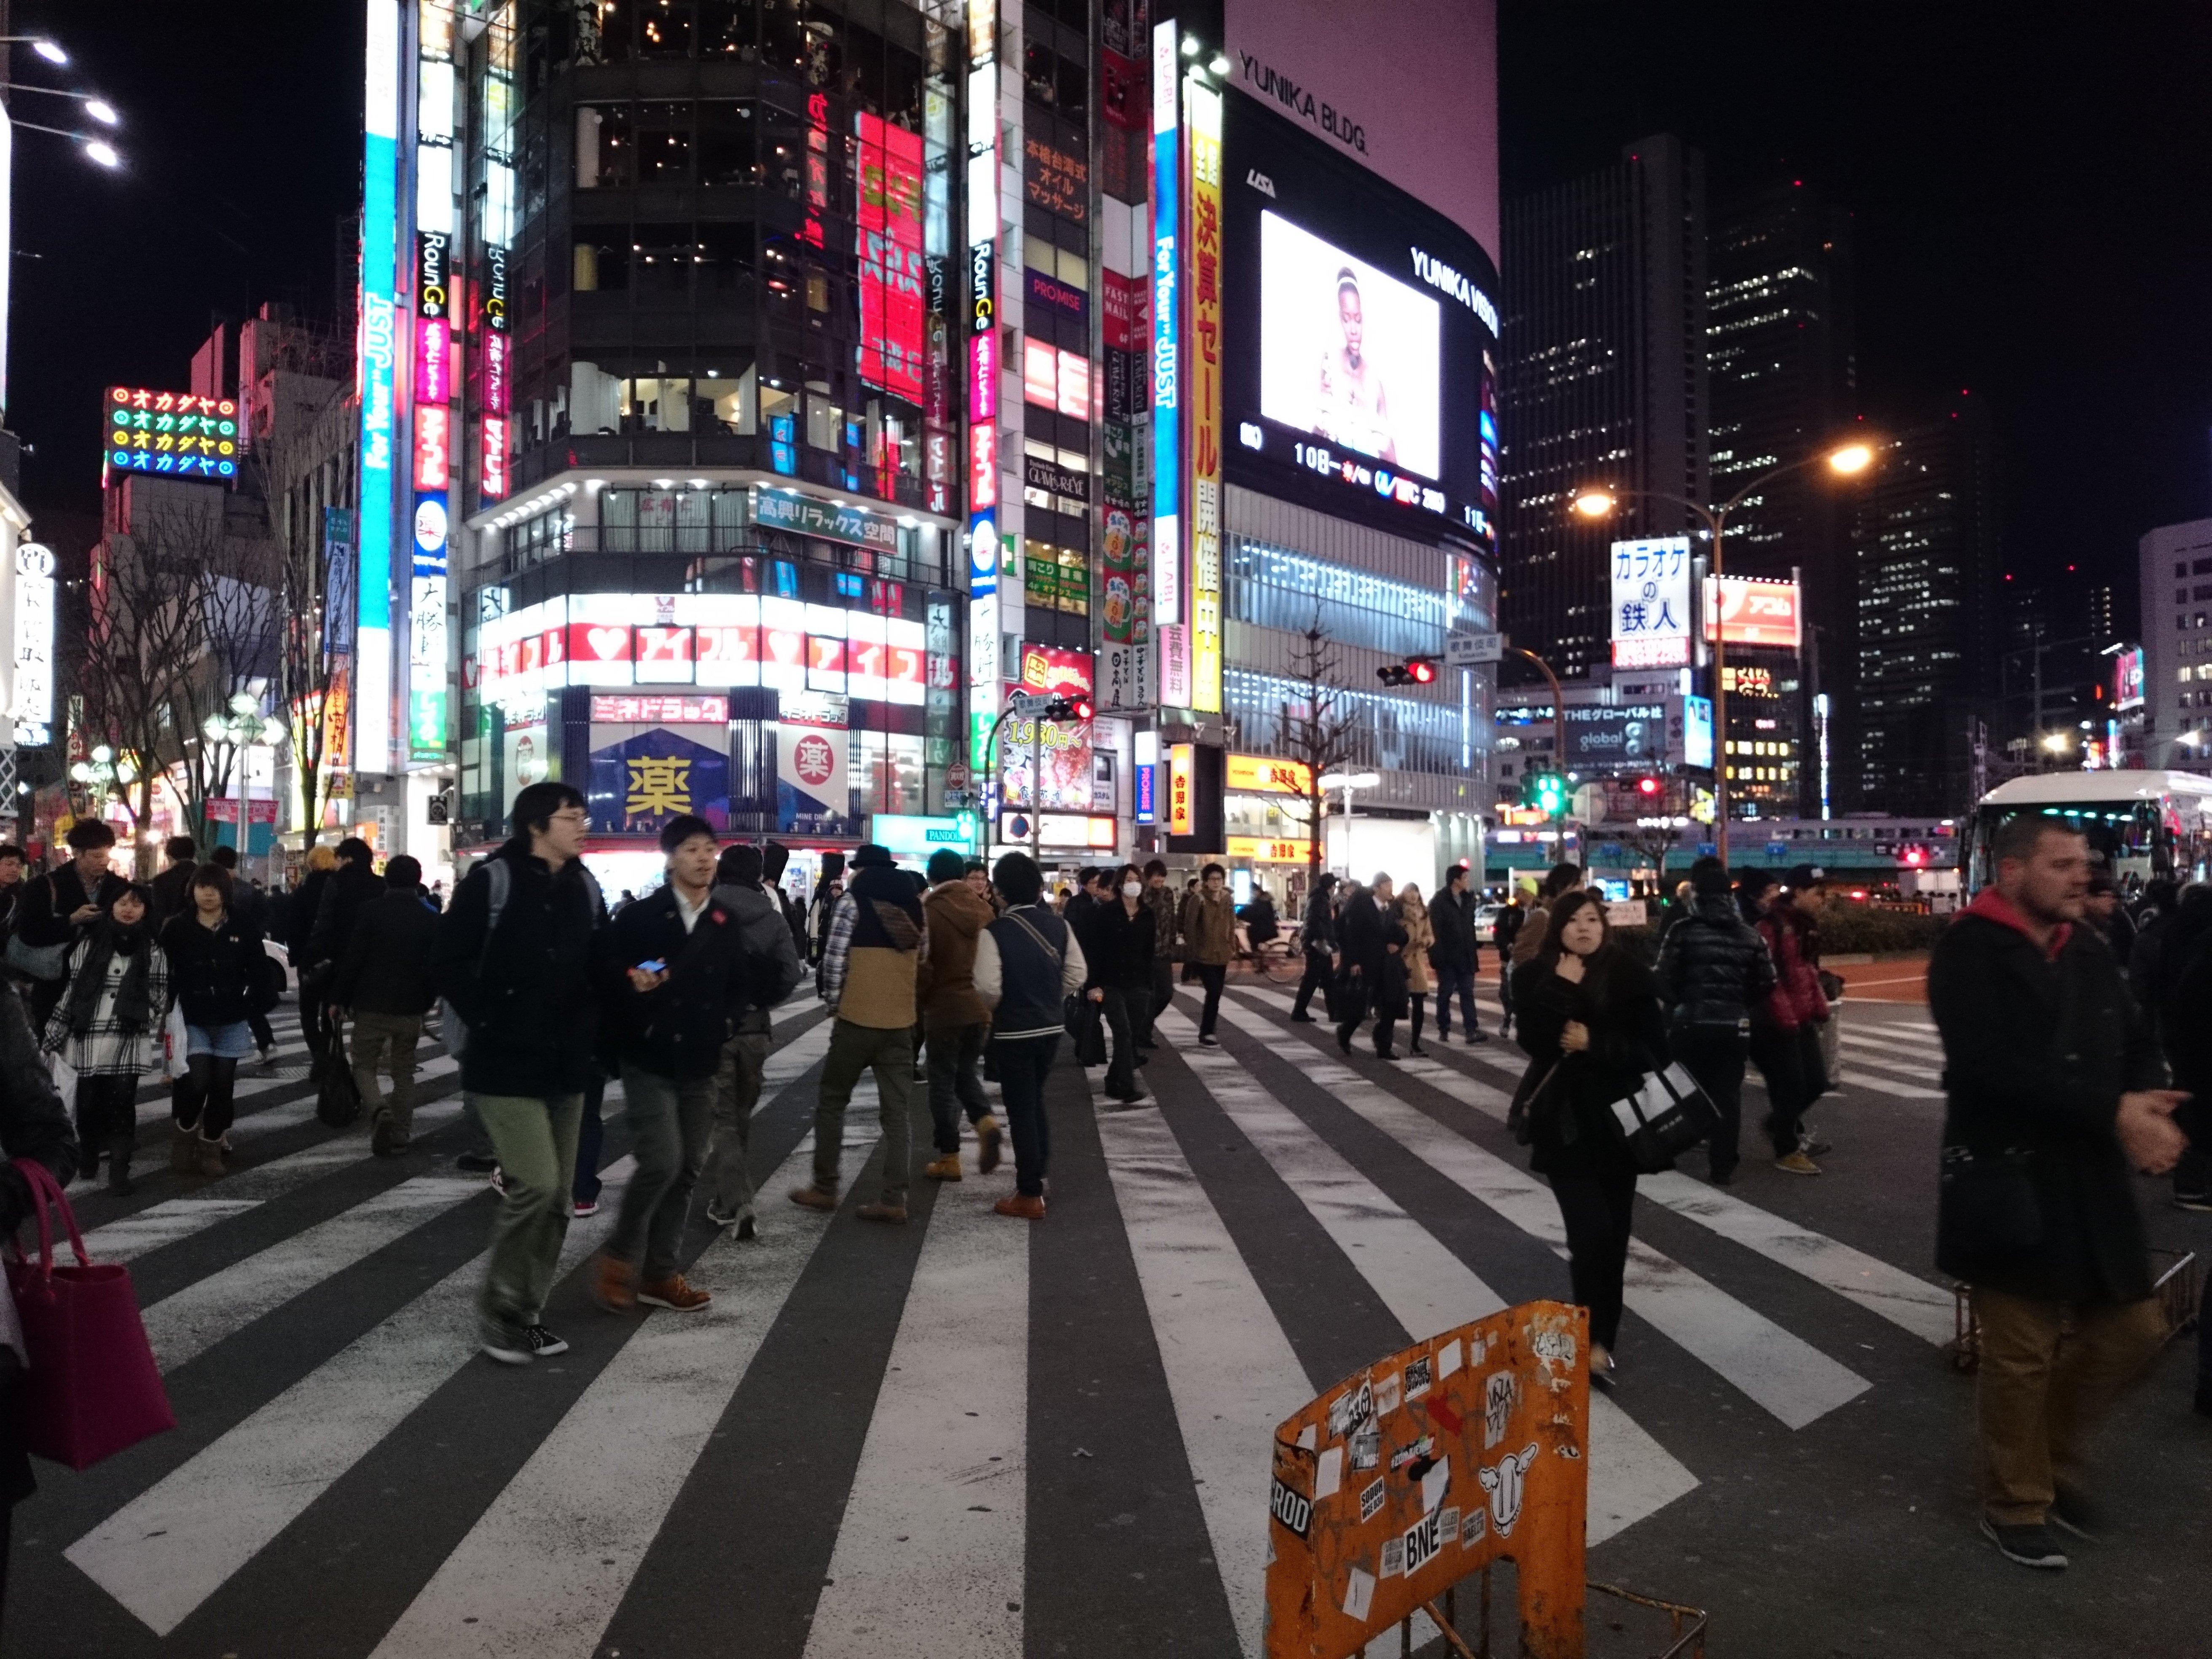 Фото с Xperia Z2 в ночное время суток